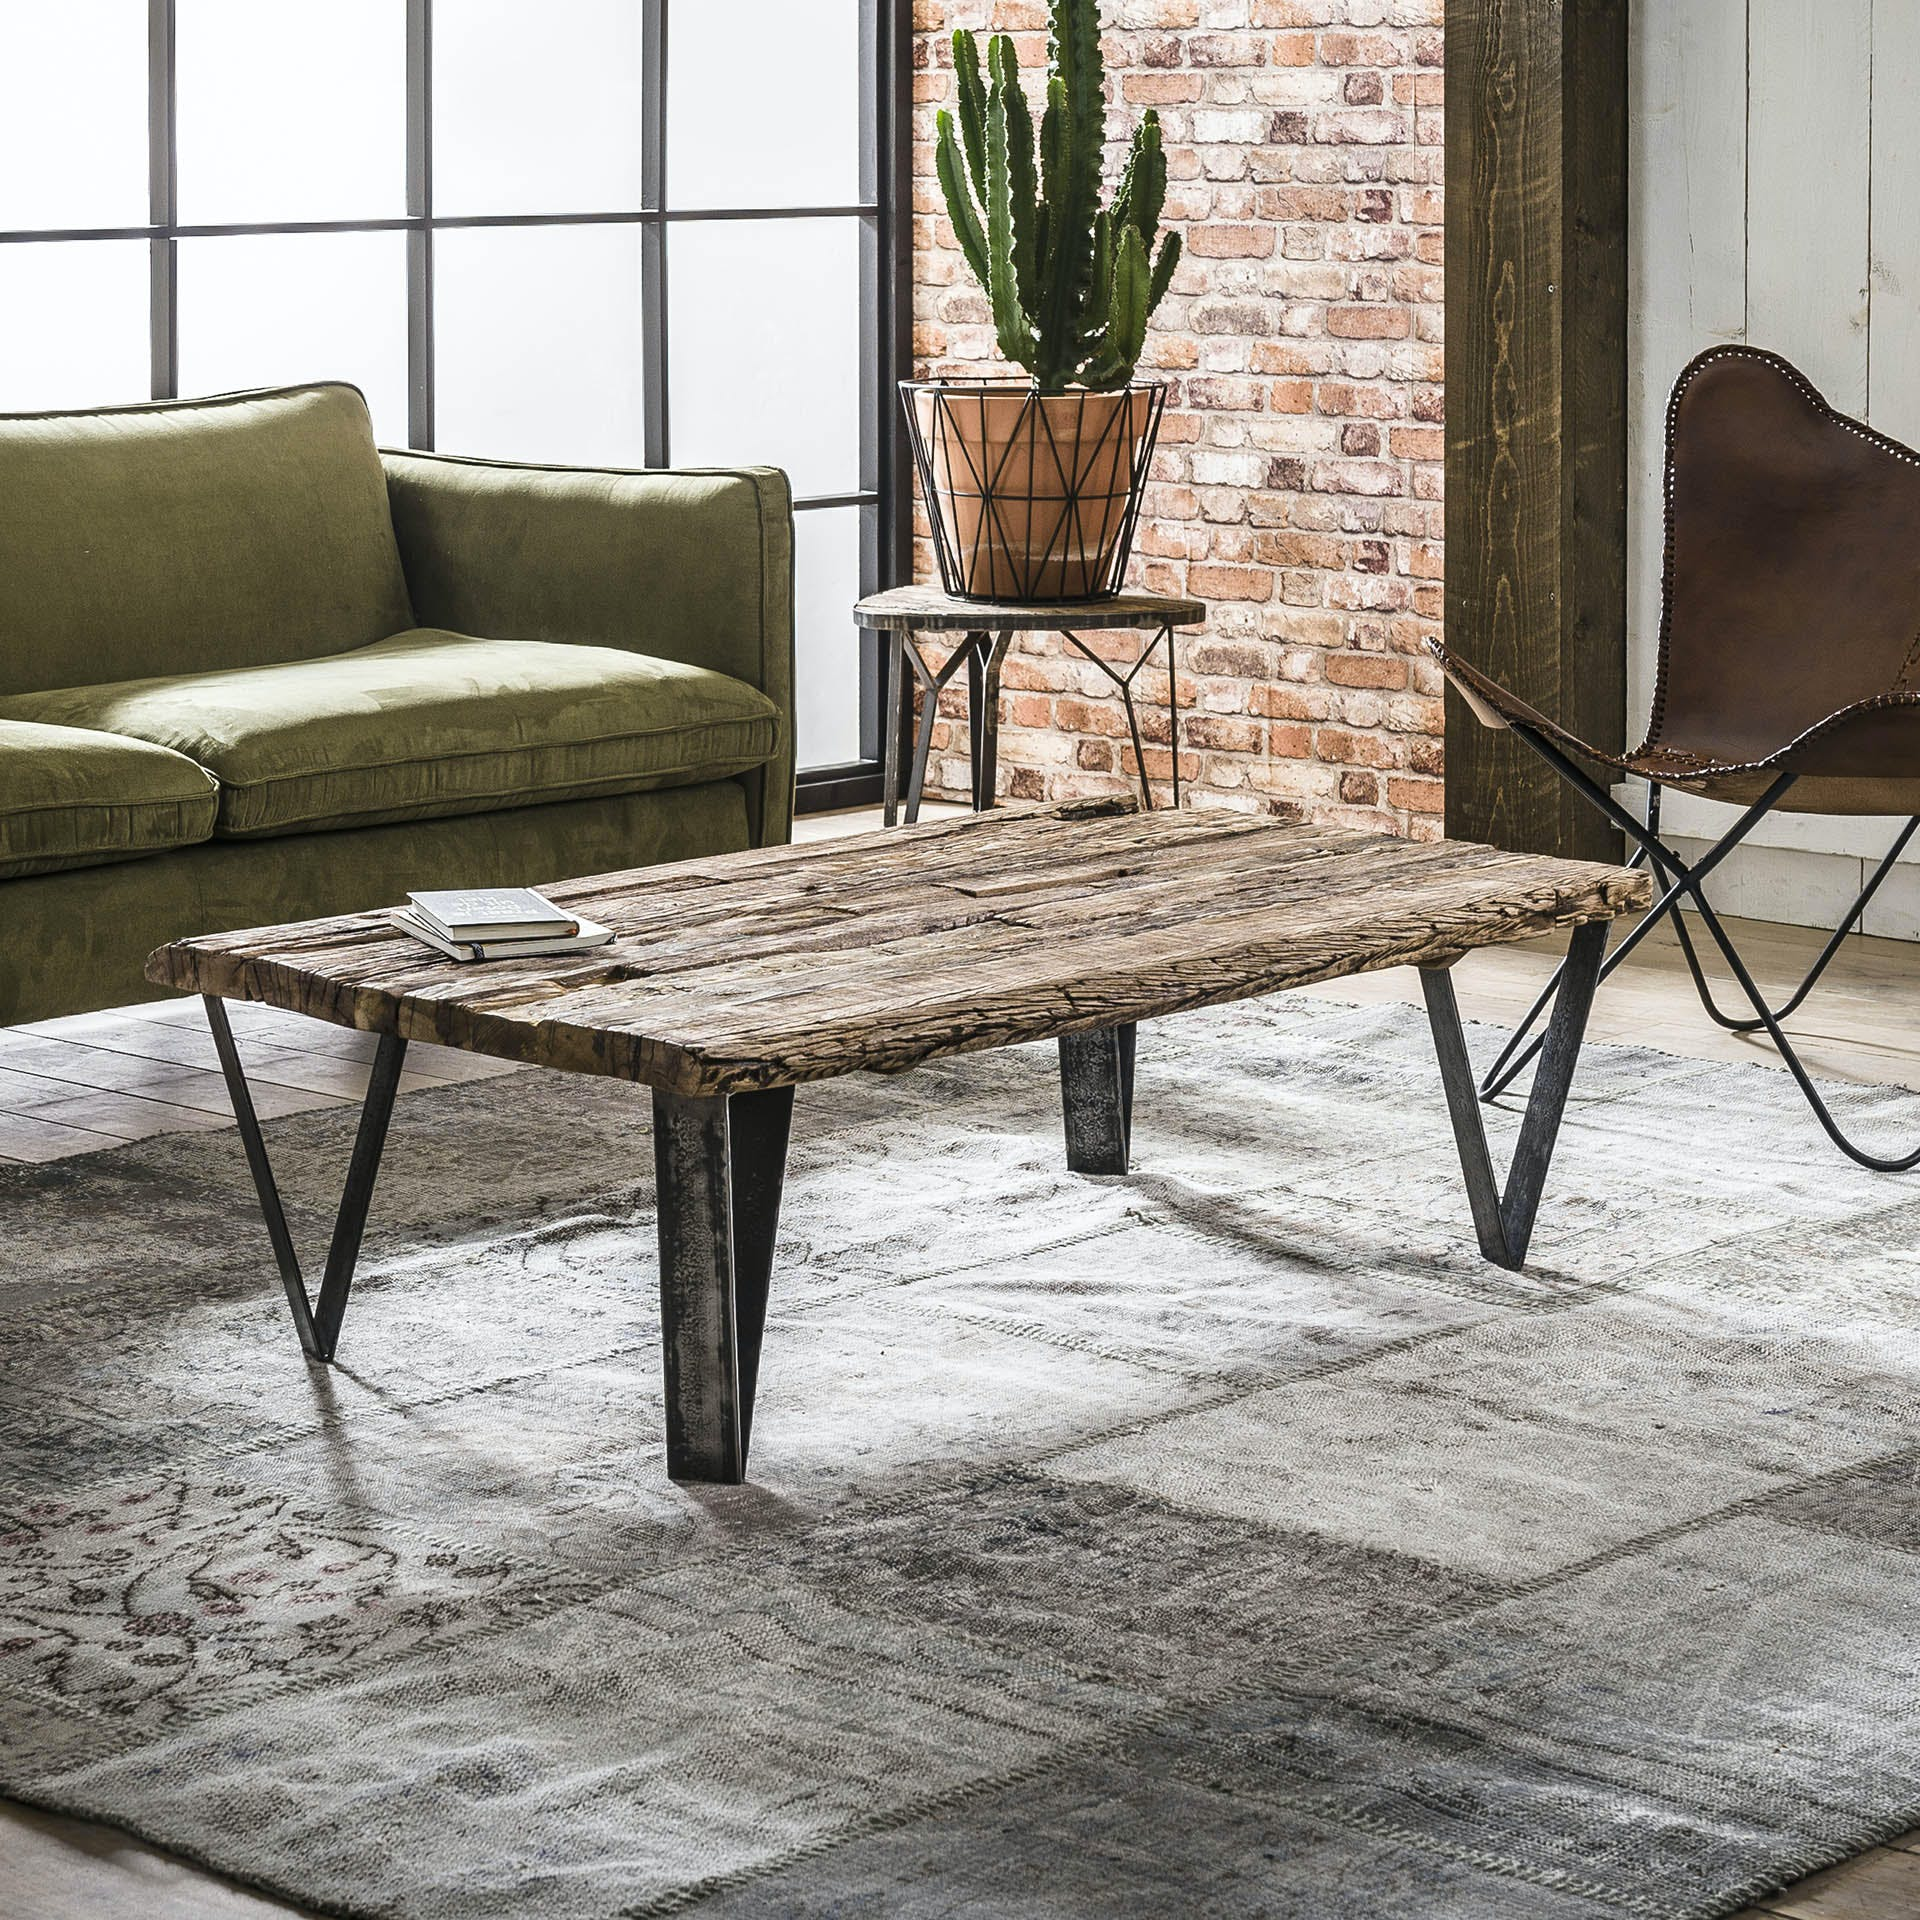 Table basse teck recyclé, pieds métal 135x75cm OMSK